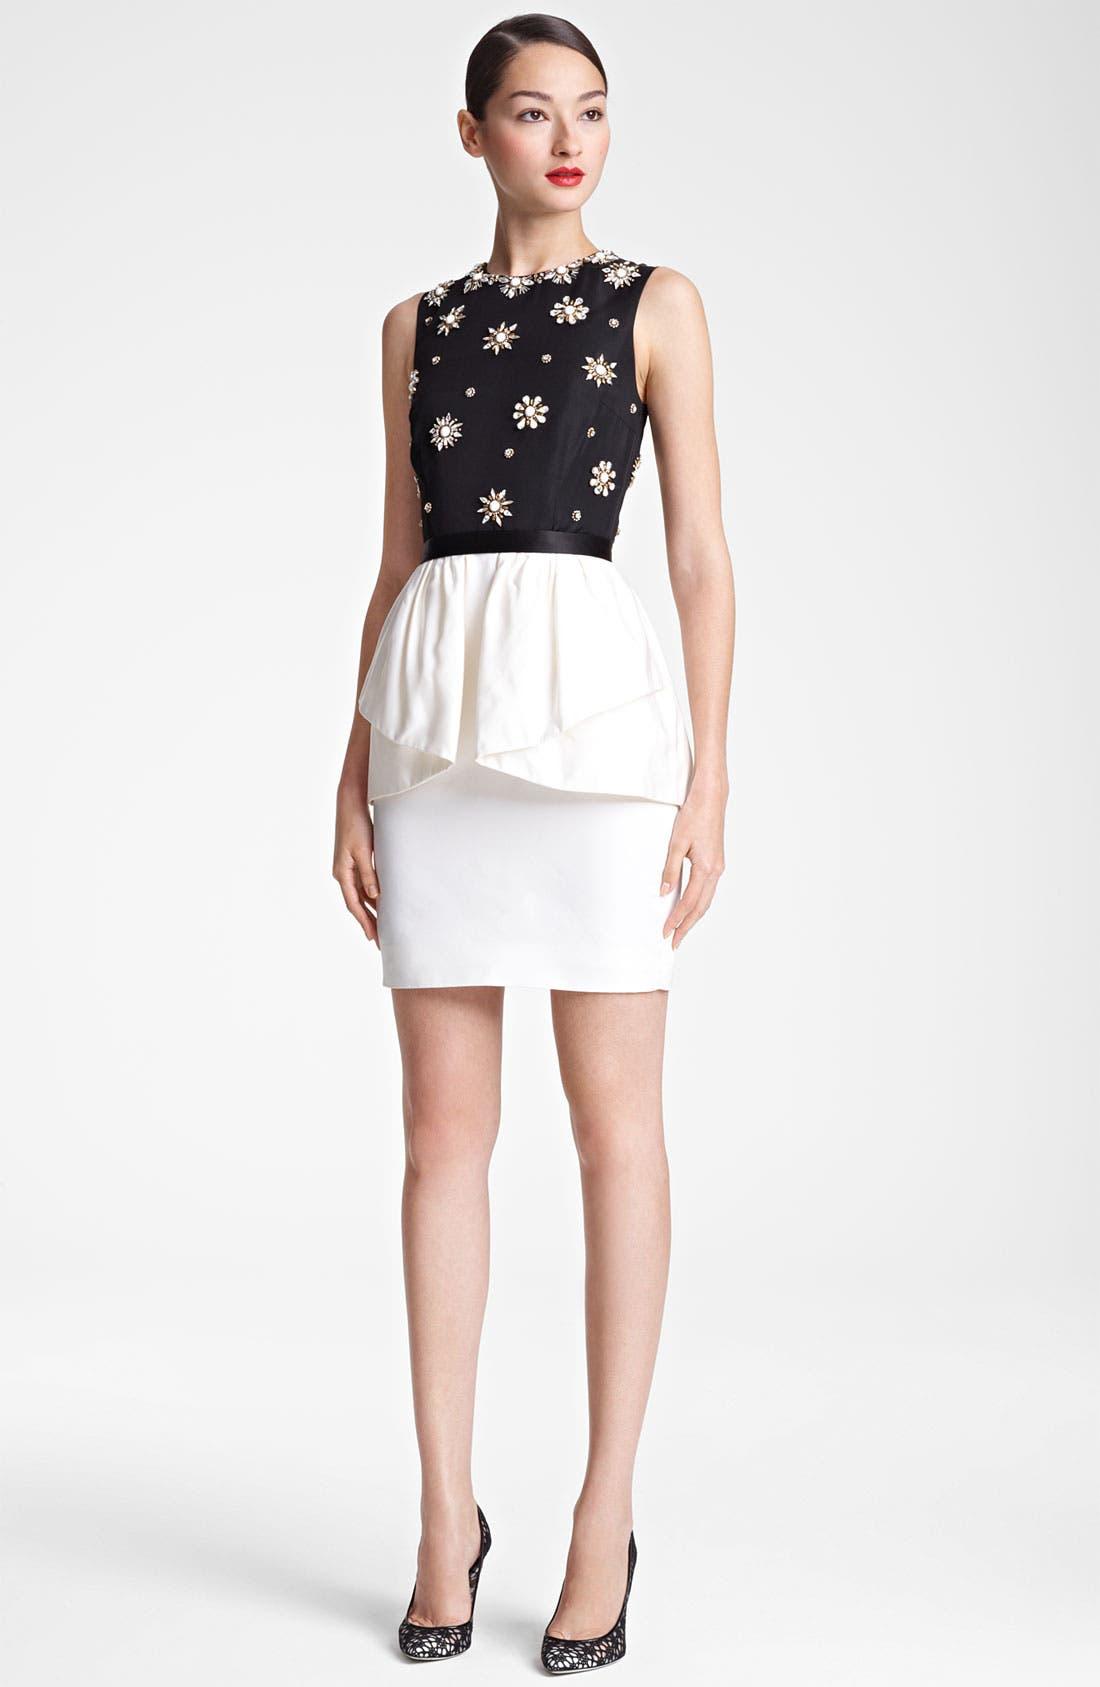 Alternate Image 1 Selected - Jason Wu Embroidered Peplum Sheath Dress